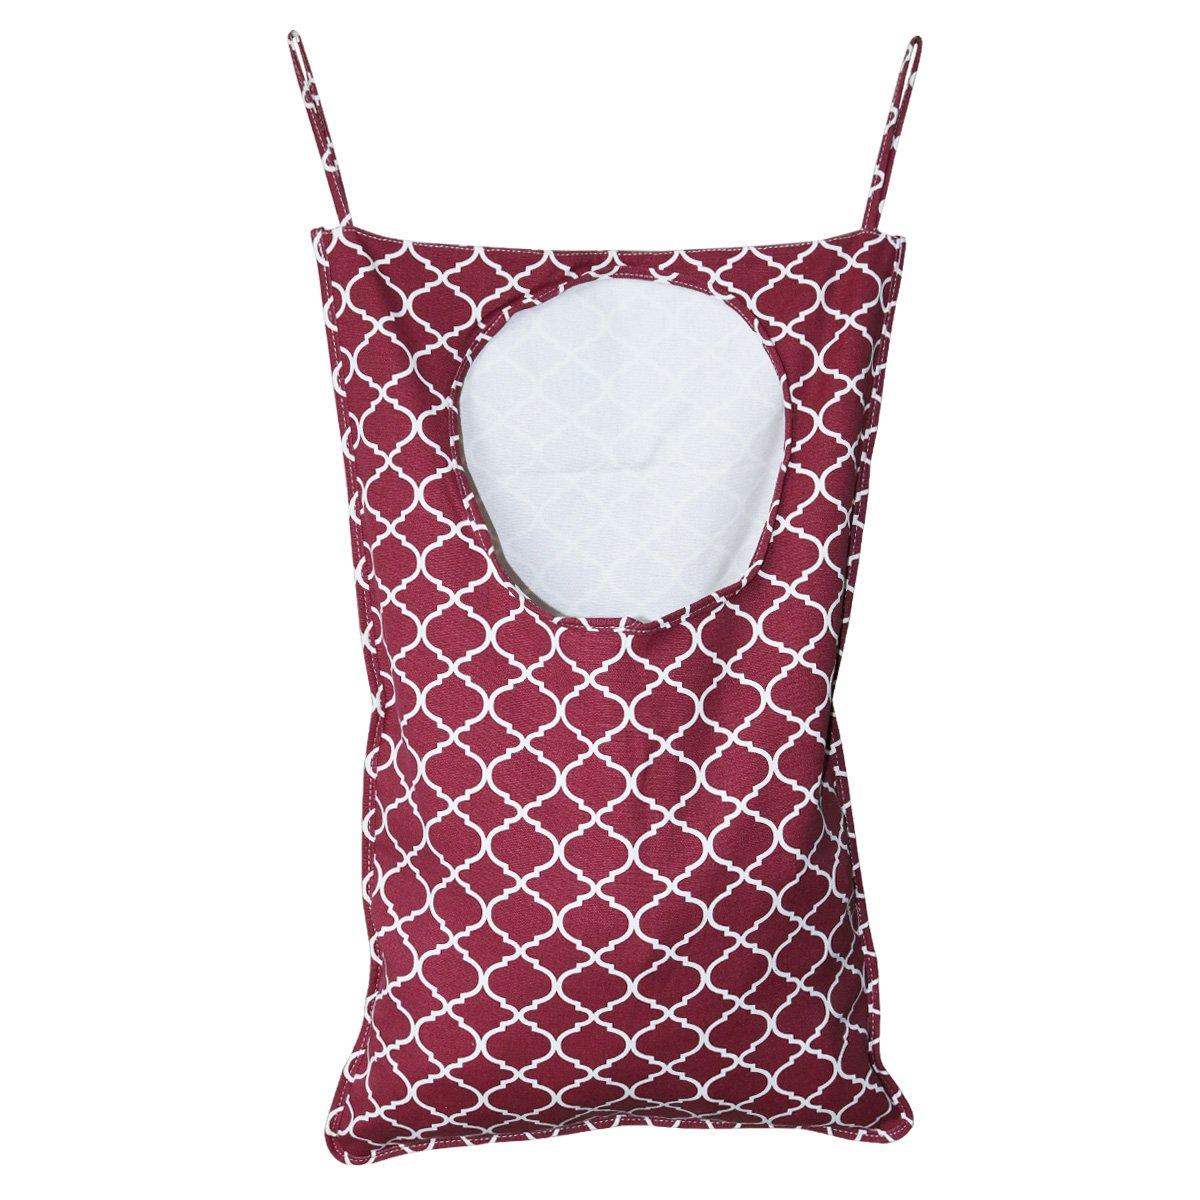 ASYOU Laundry Hamper,Cotton Canvas Hanging Laundry Hamper Bag For Closets, Dorms, Travel, Storage (Blue)